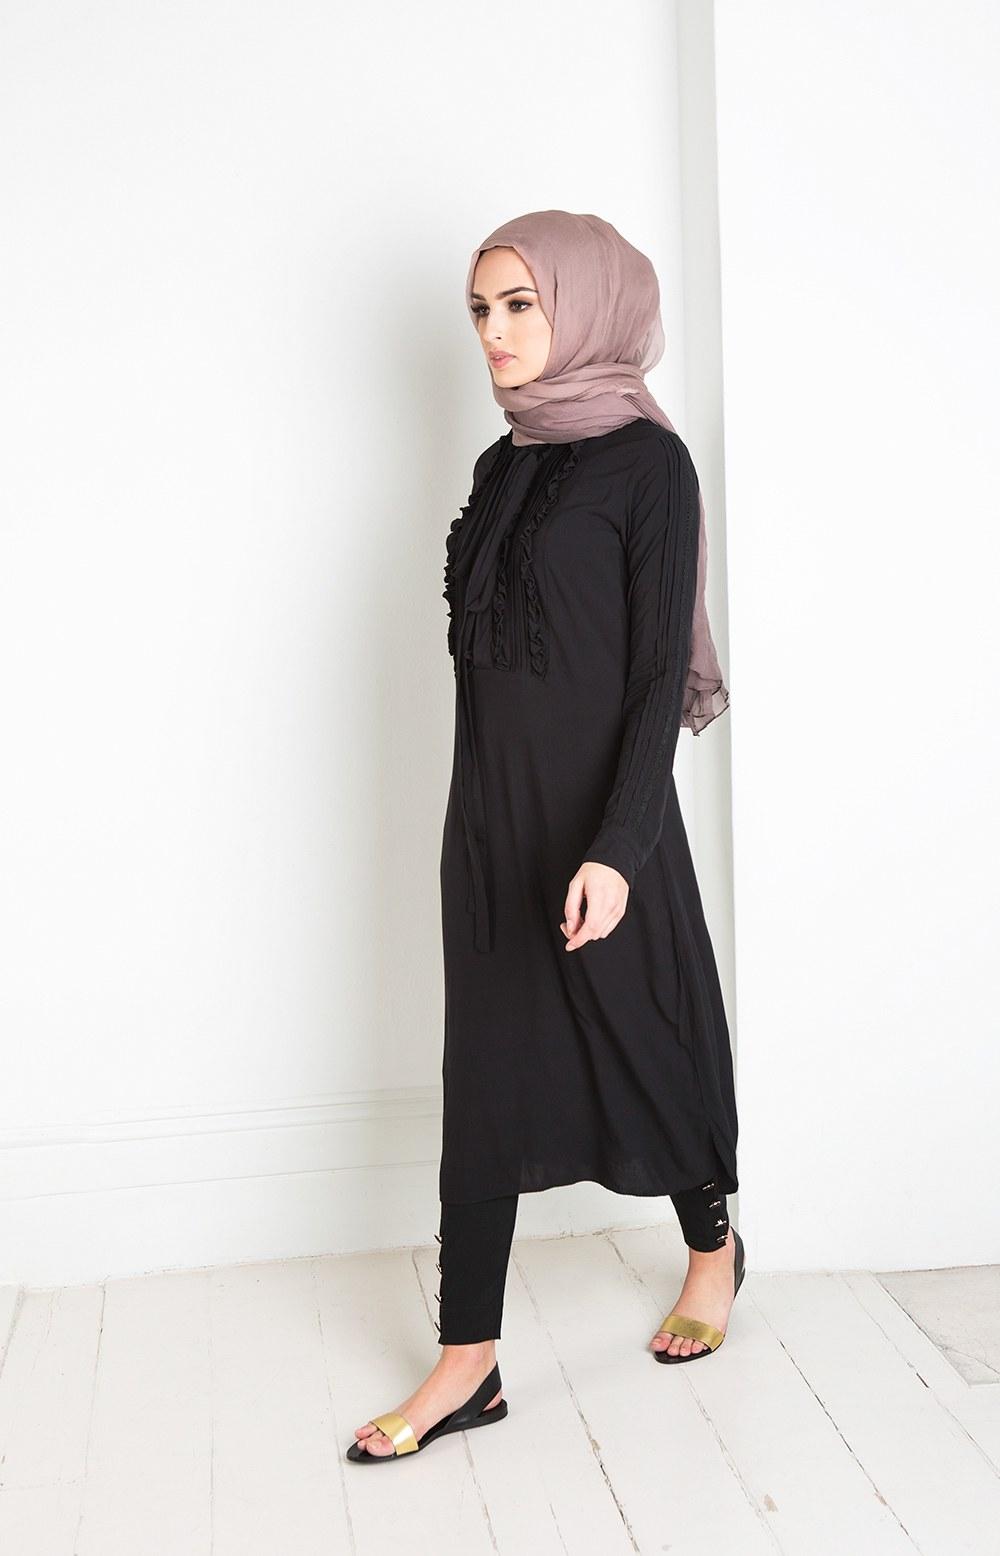 Model Baju Lebaran Trend 9fdy 25 Trend Model Baju Muslim Lebaran 2018 Simple & Modis